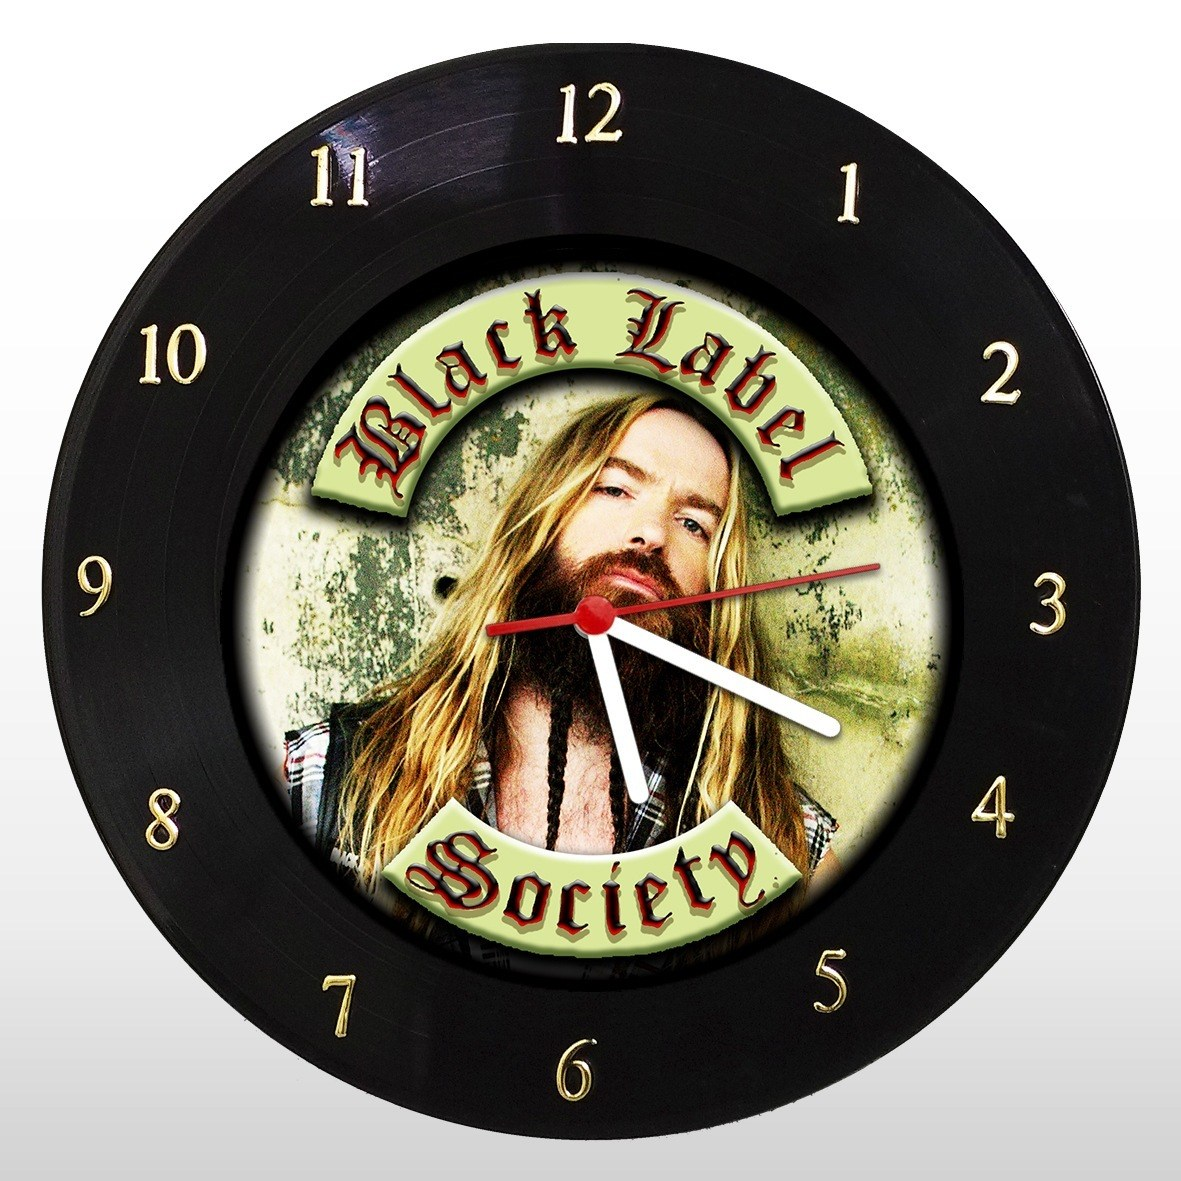 Black Label Society - Relógio de Parede em Disco de Vinil - Mr. Rock